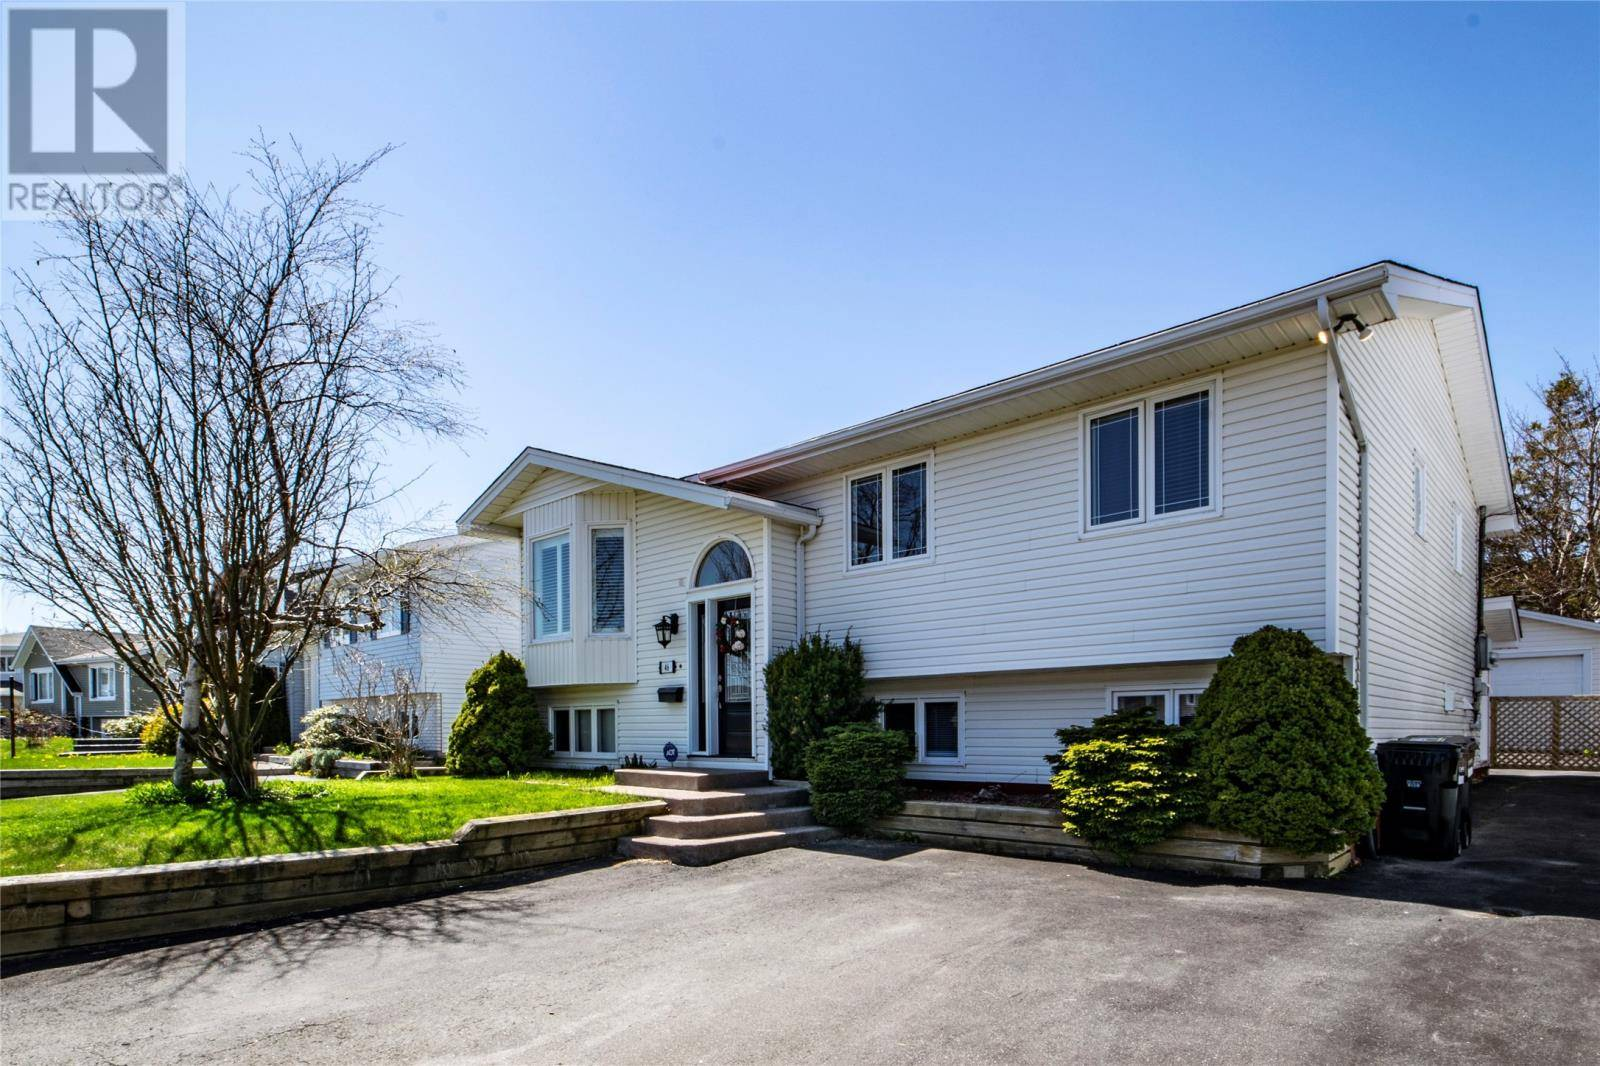 House for sale at 46 Bellevue Cres St. John's Newfoundland - MLS: 1206803